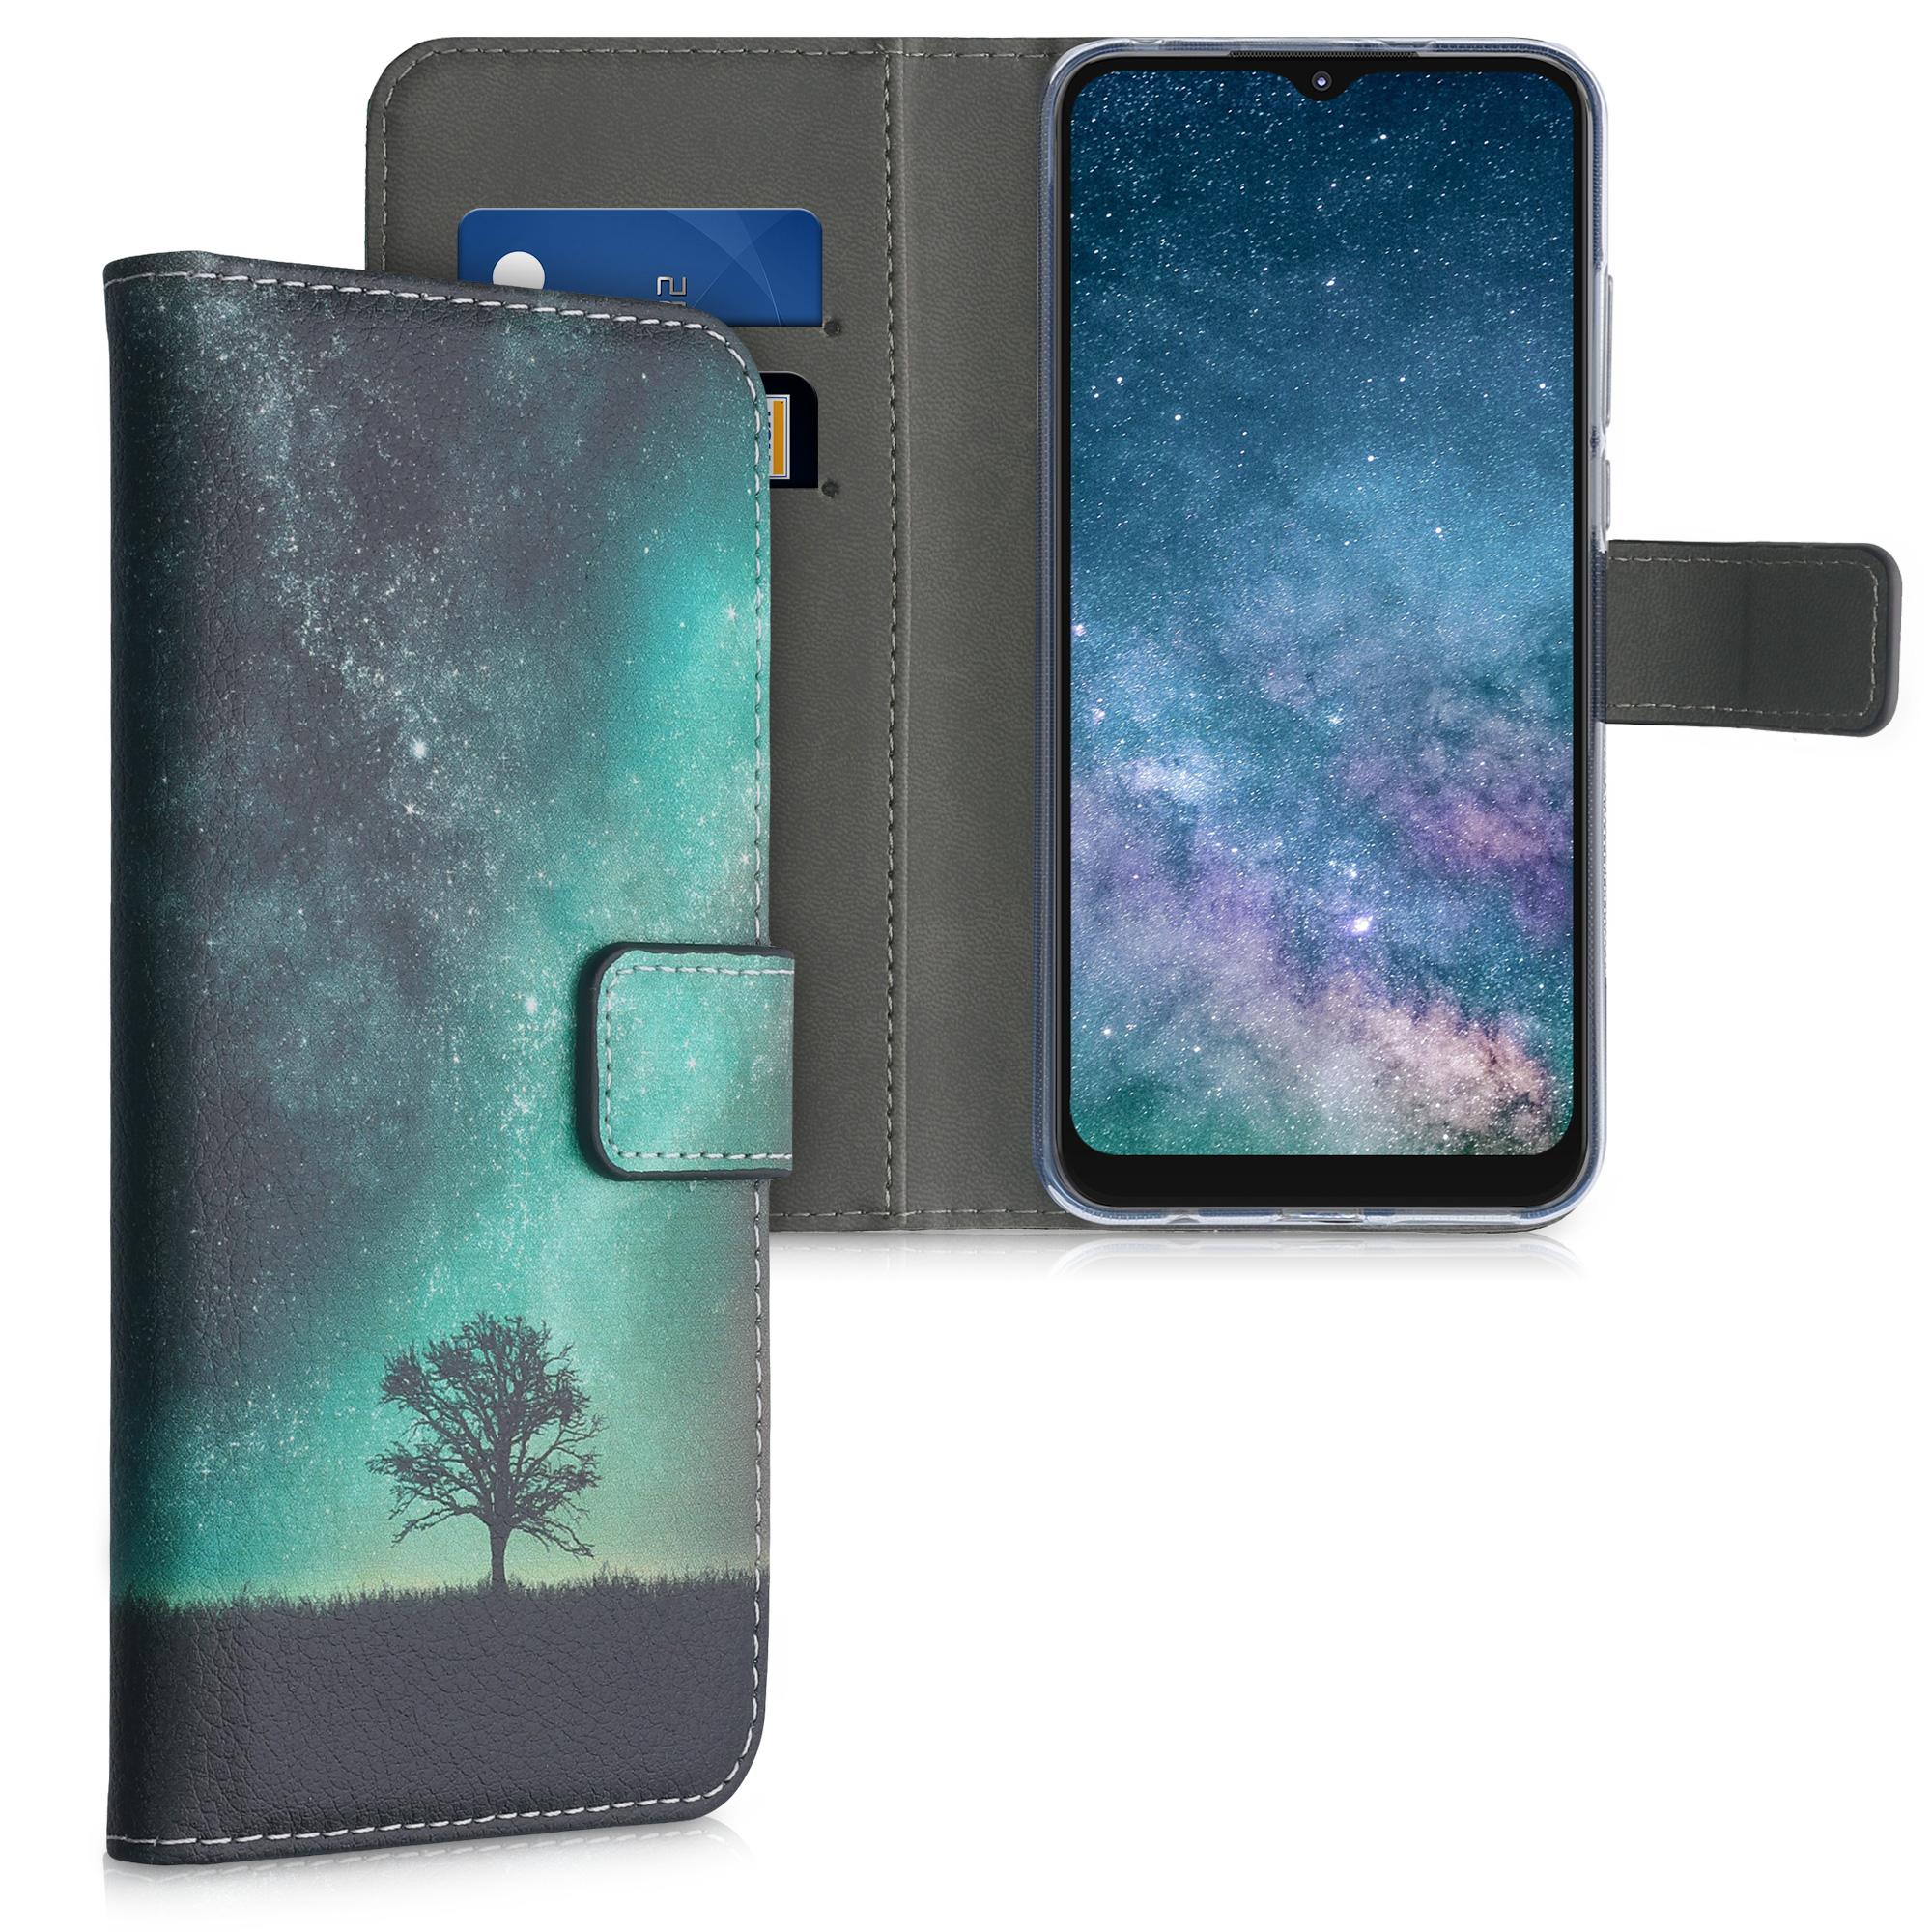 Kožené pouzdro   obal pro Motorola Moto G Play (2021) - Kosmická příroda Modrá / Šedá / Černá